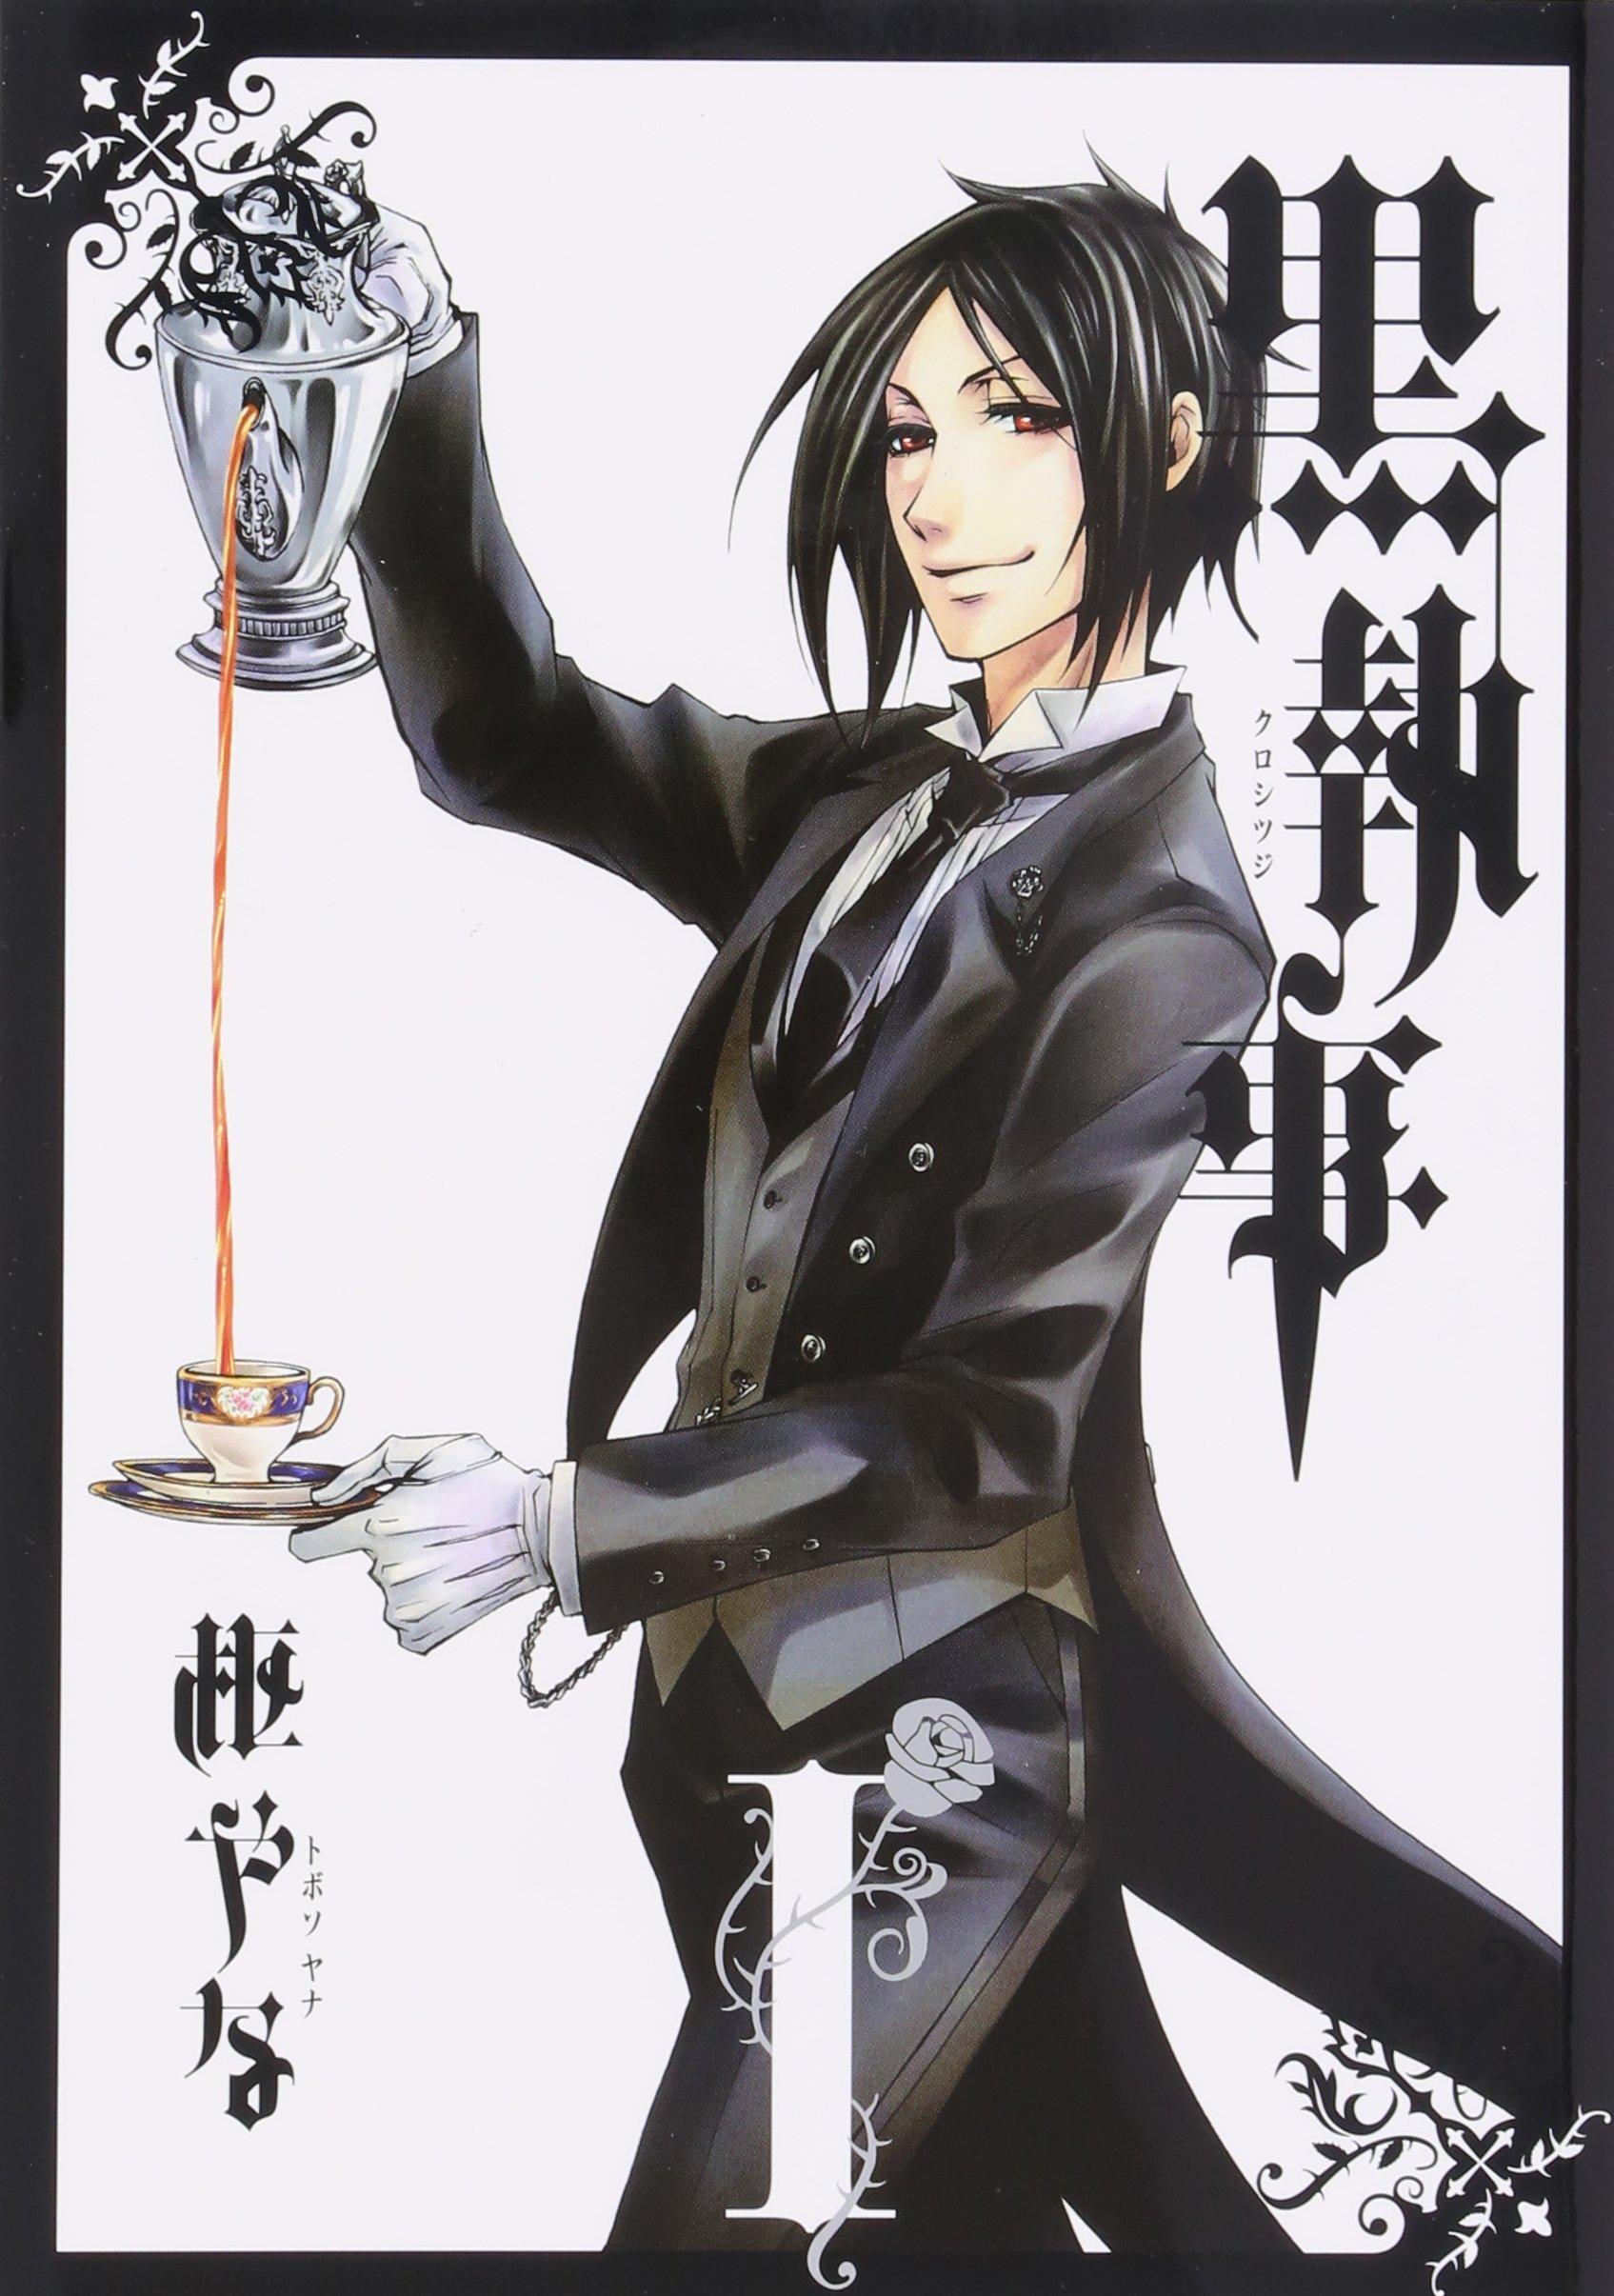 Kuroshitsuji Black Butler visual